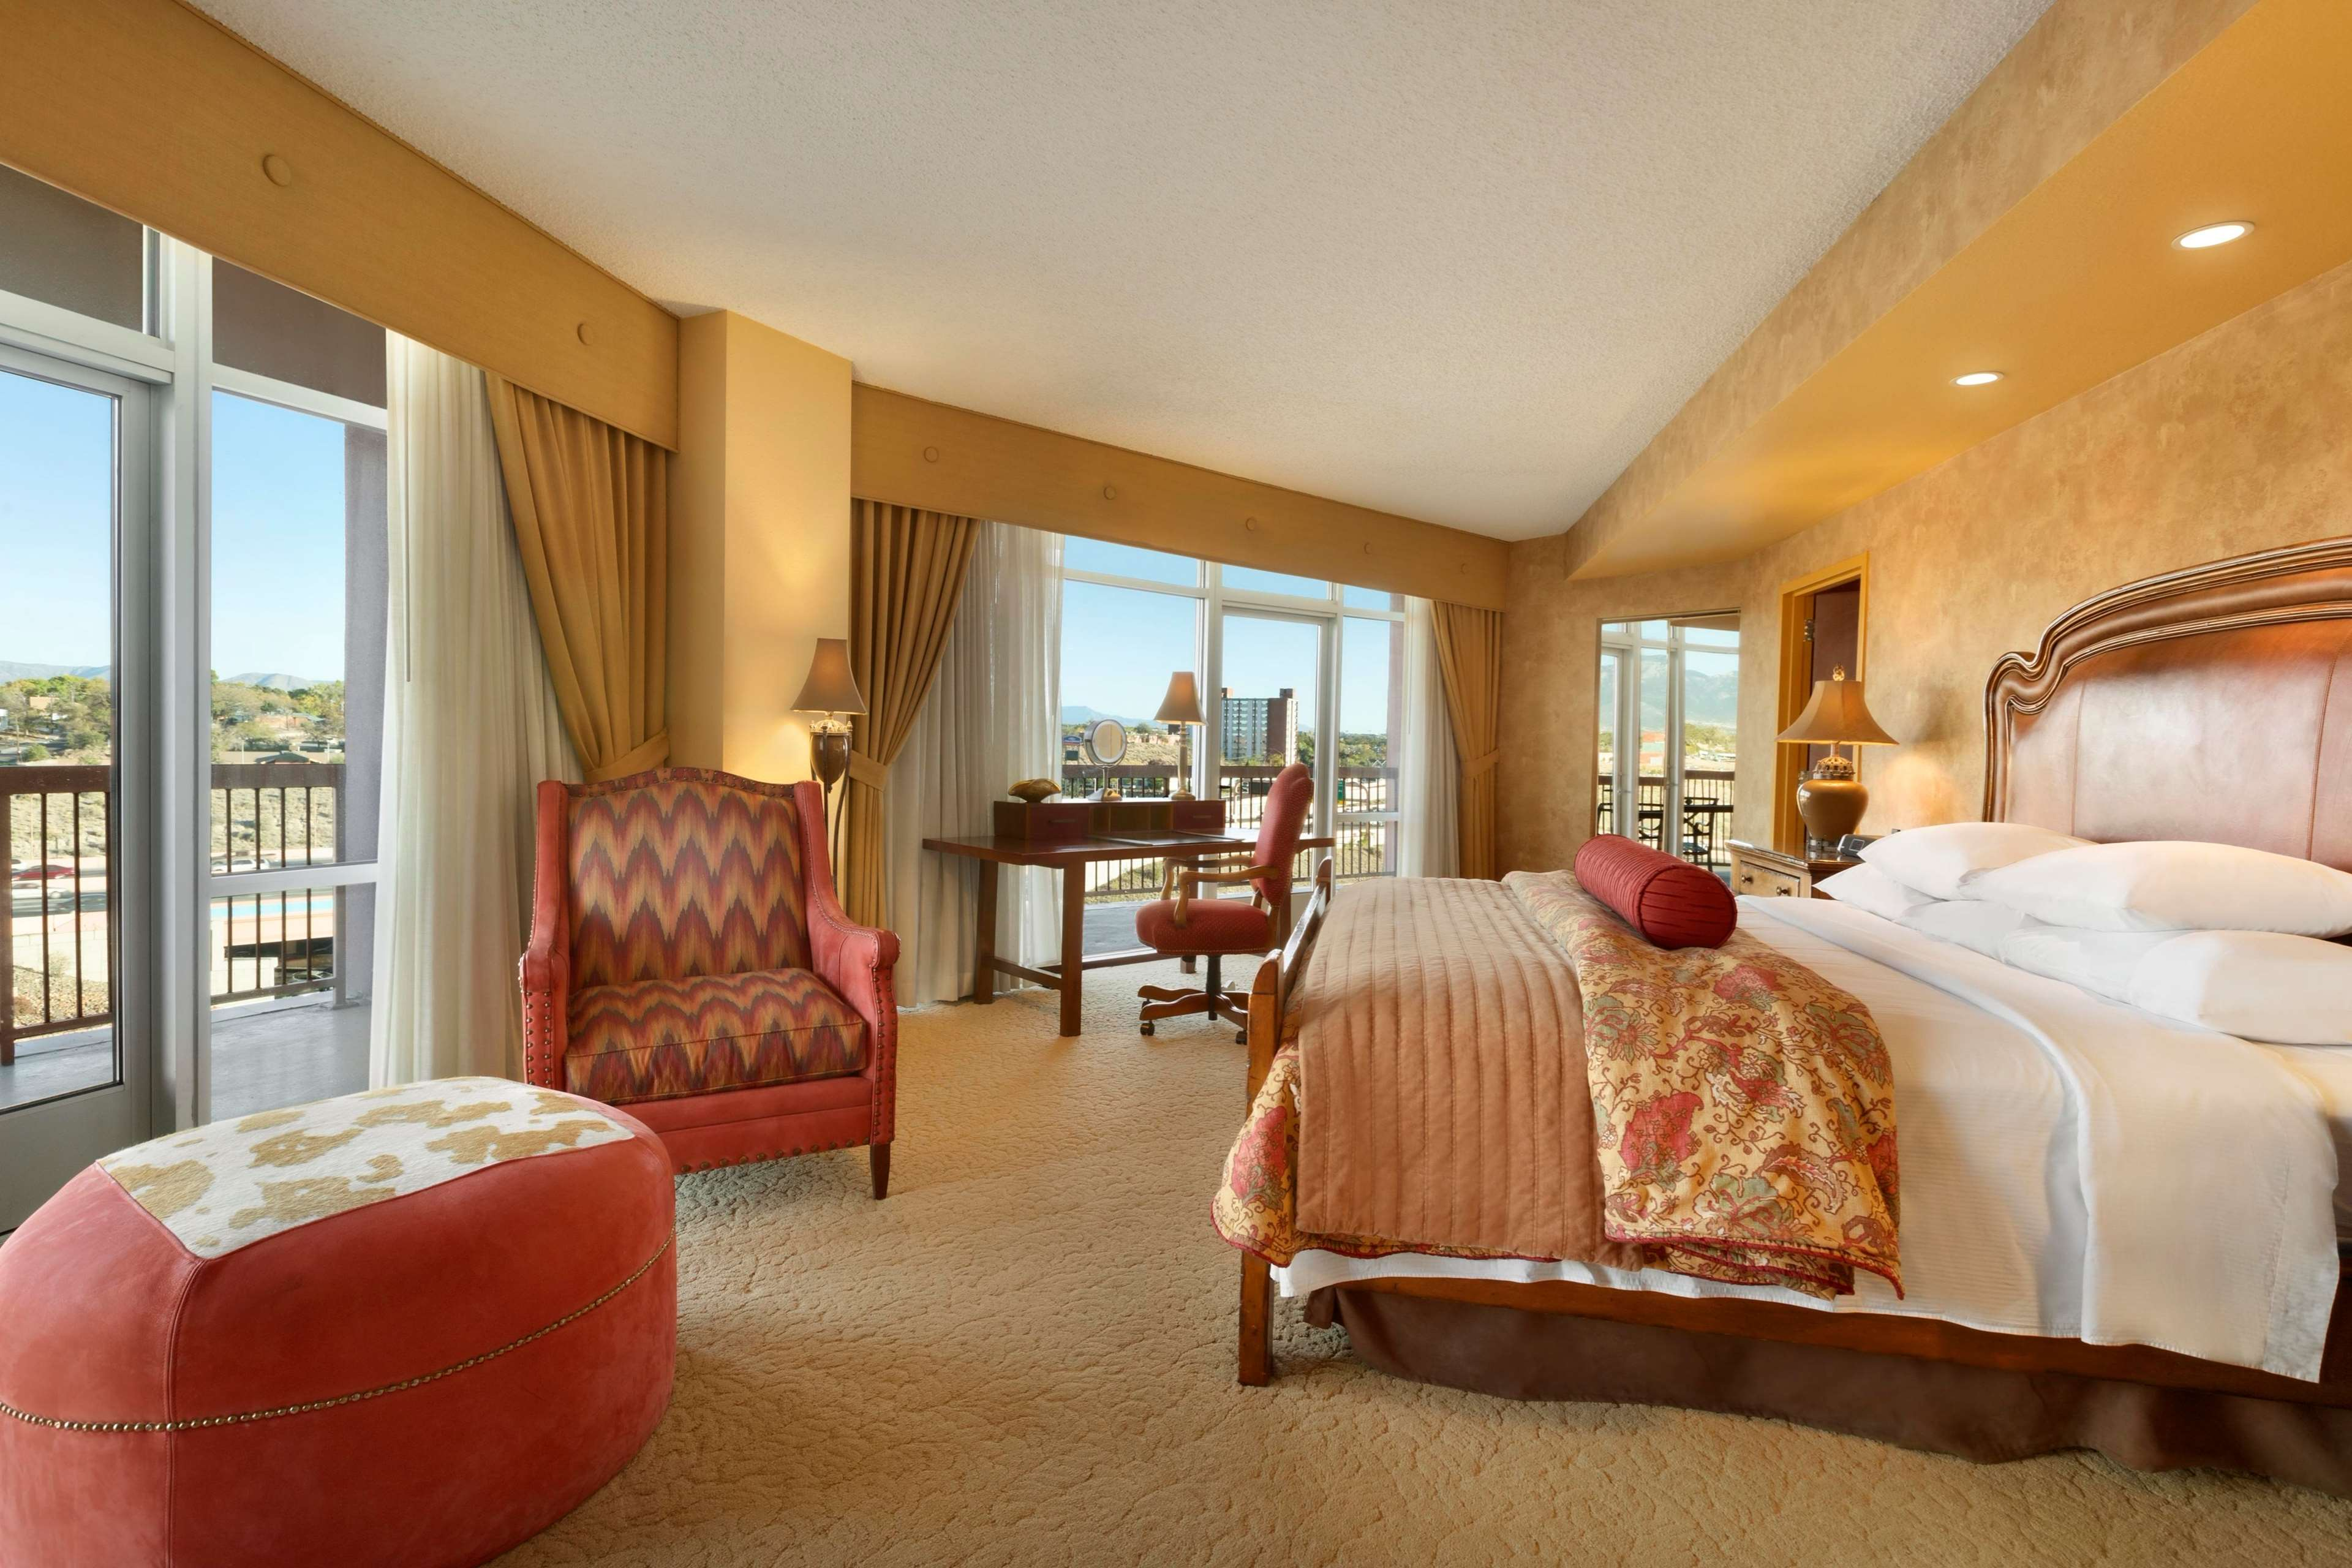 Embassy Suites by Hilton Albuquerque Hotel & Spa image 33